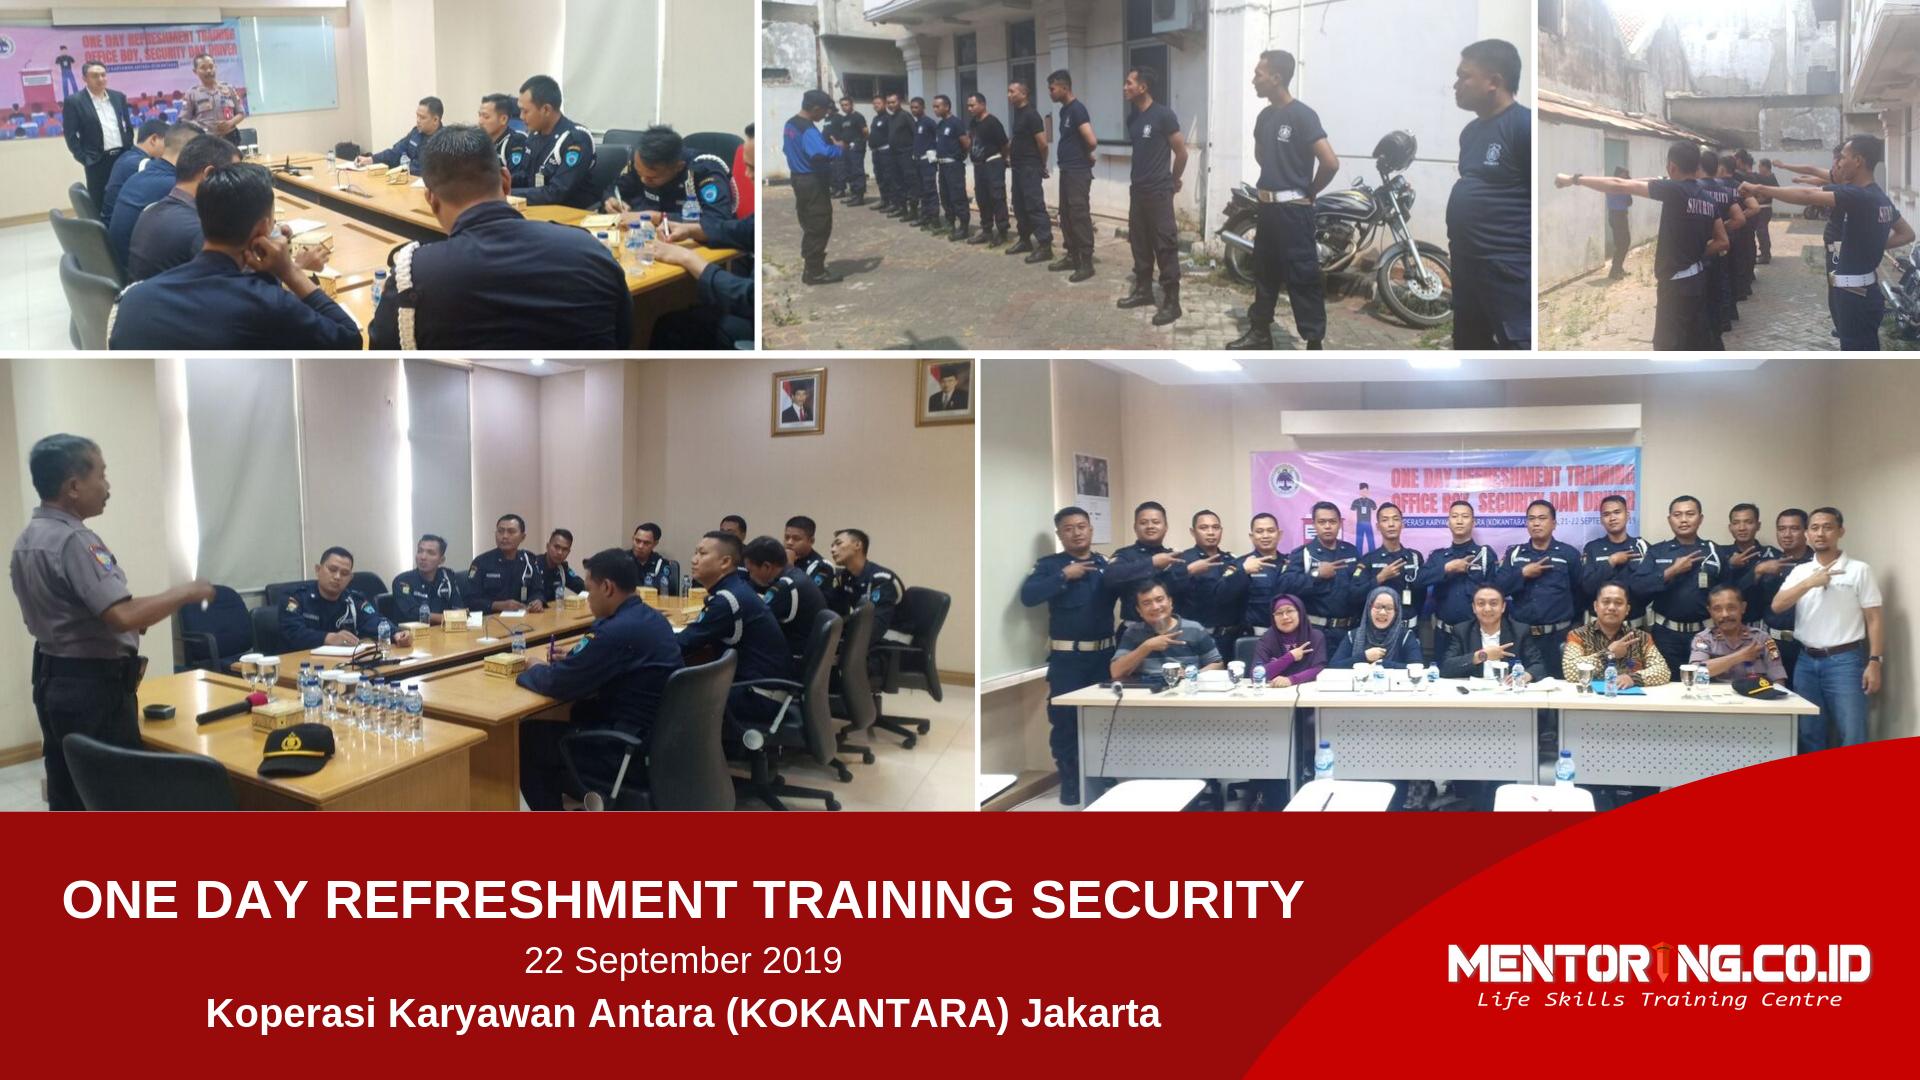 Refreshment Training Security Kokantara Jakarta